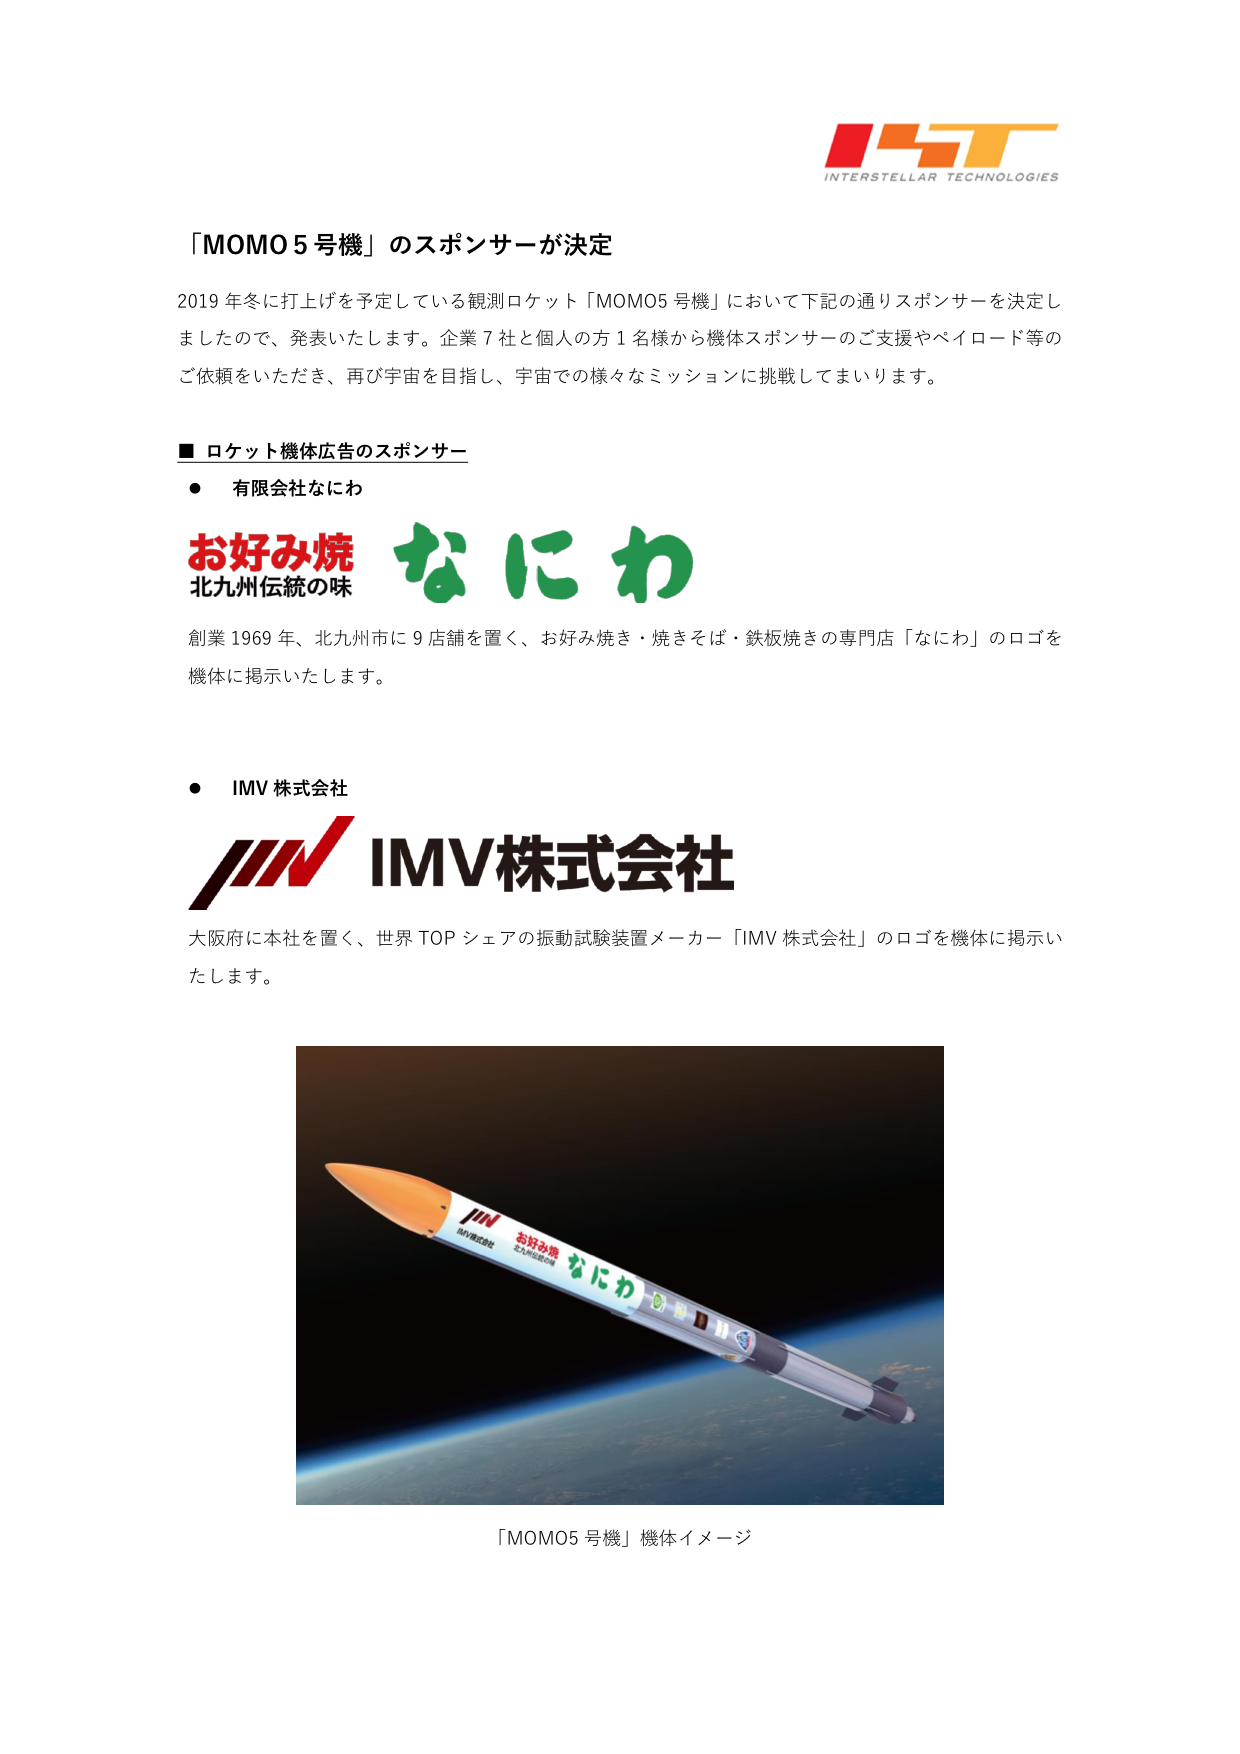 f:id:Imamura:20191126135412p:plain